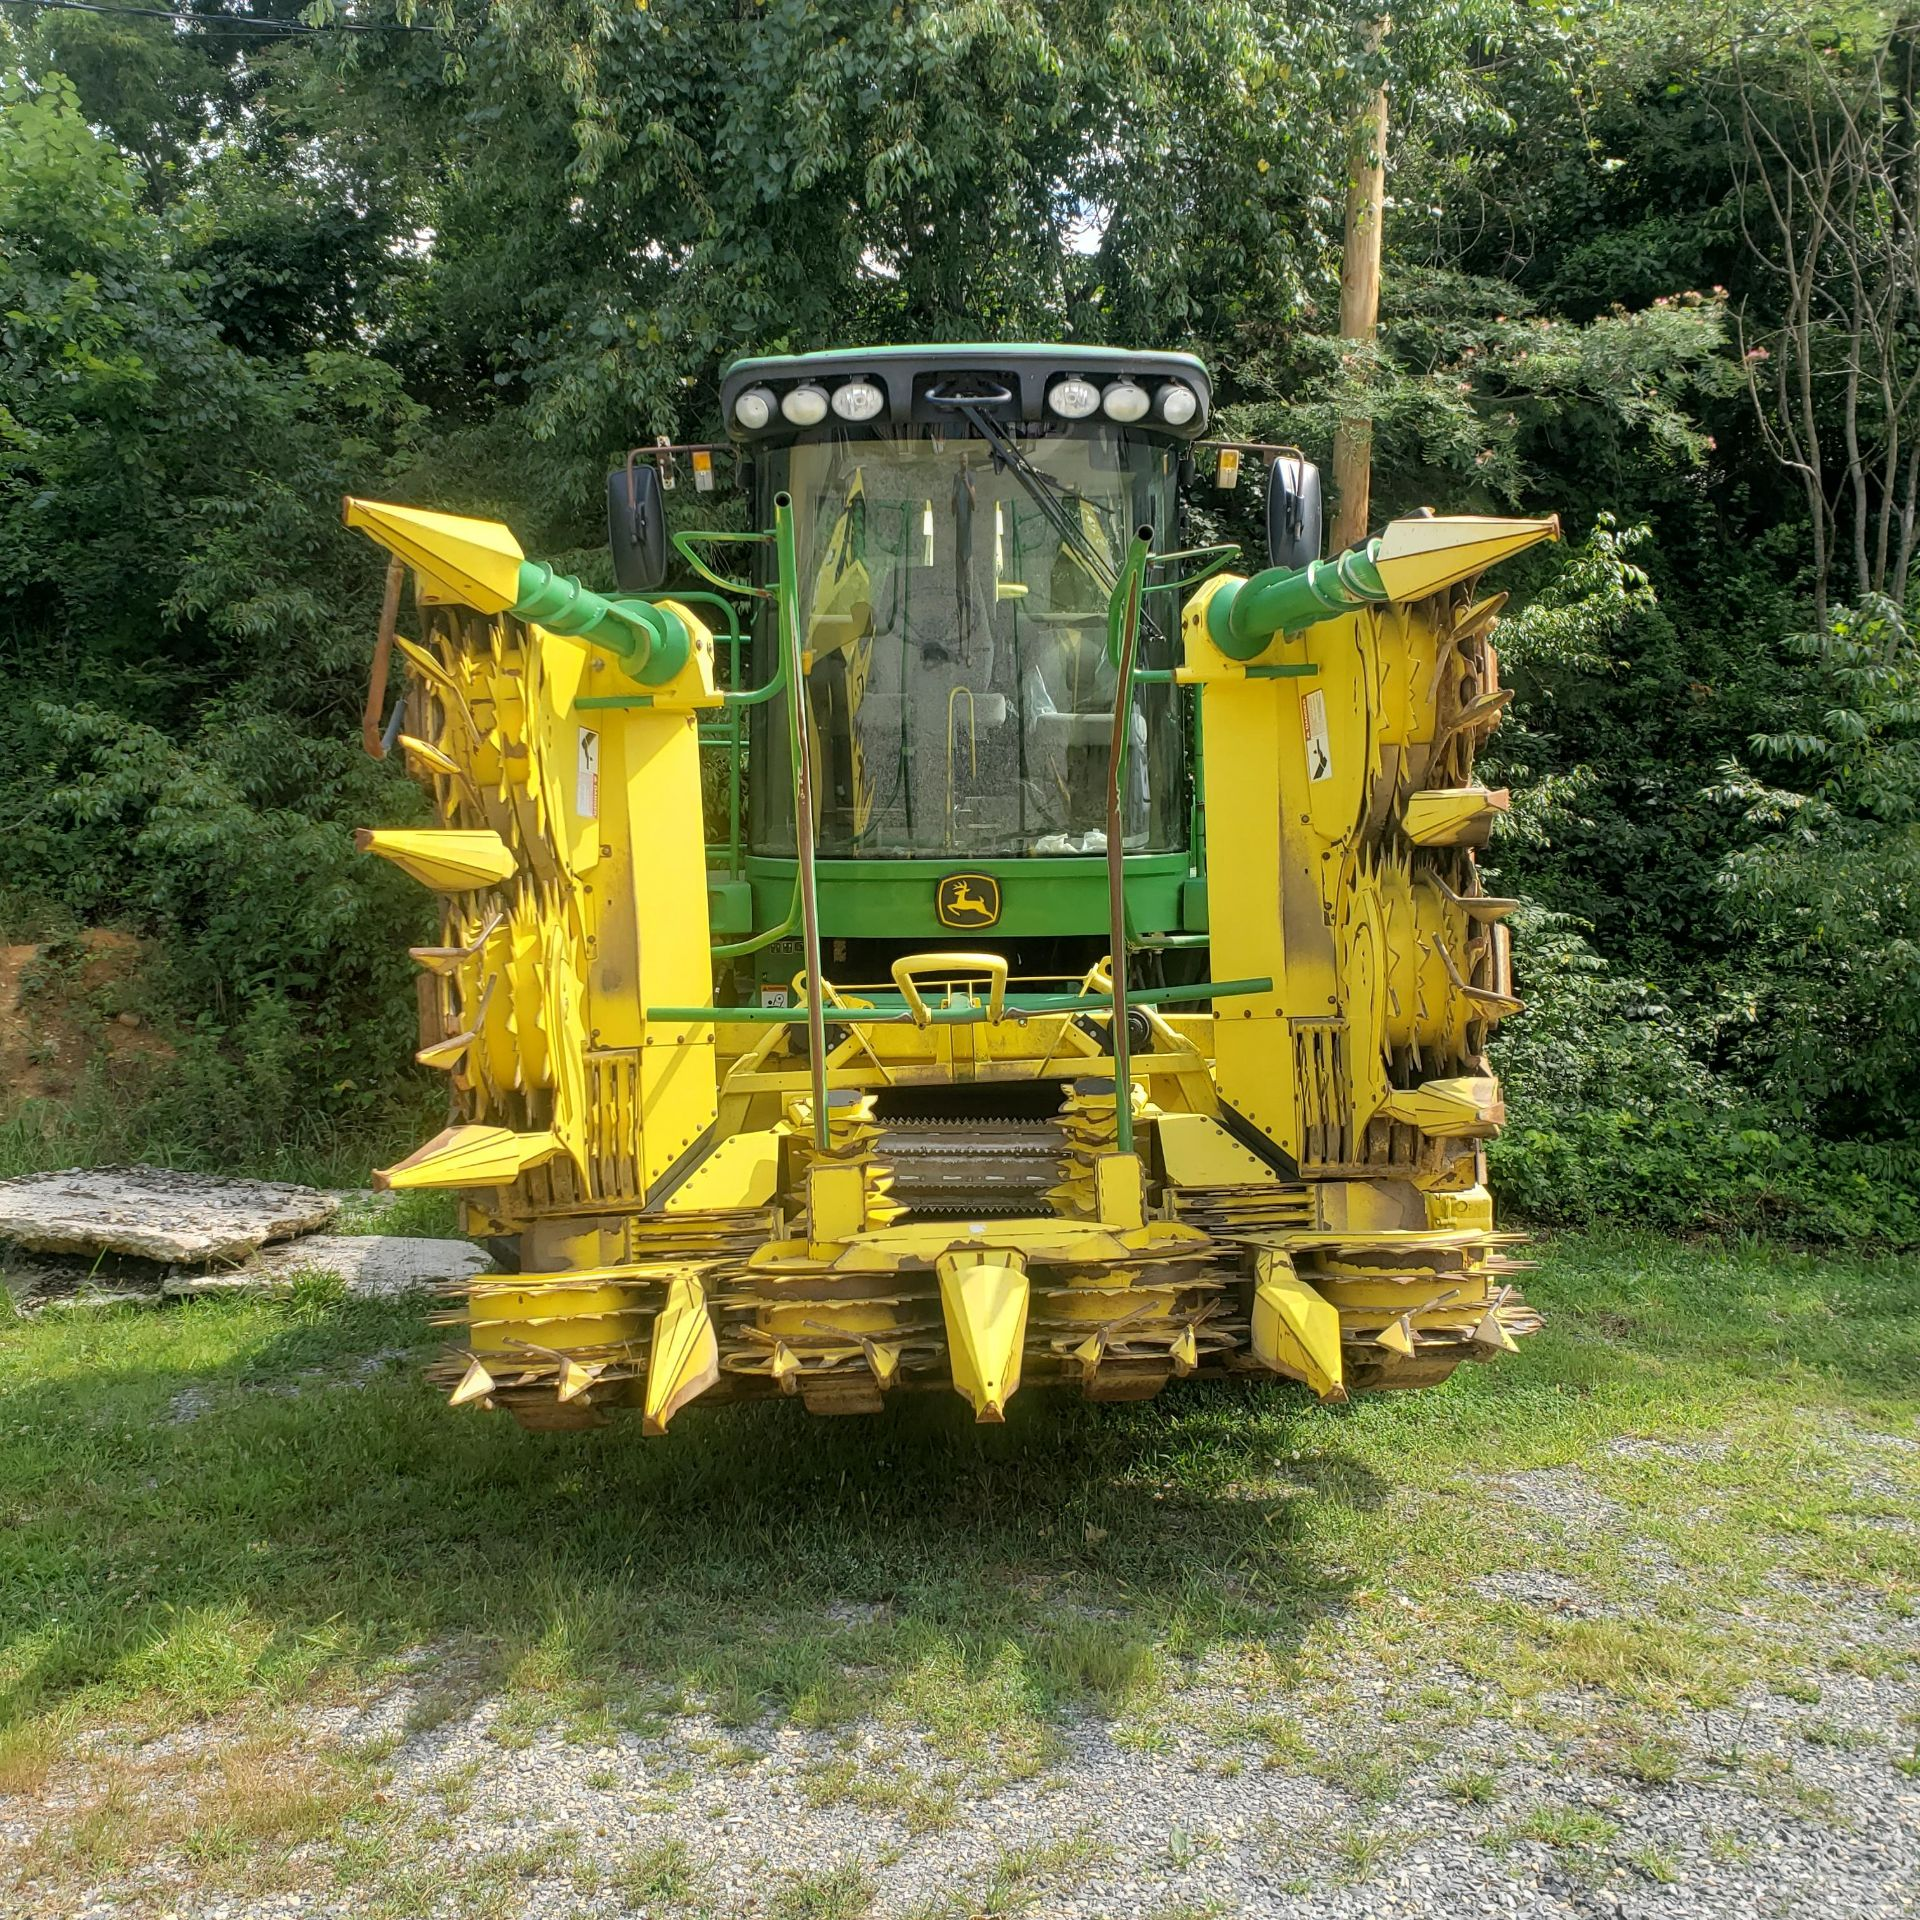 Used-John Deere 7450 Tractor. Model 7450. 1881 hrs. 688 Chopper Head - Image 4 of 10